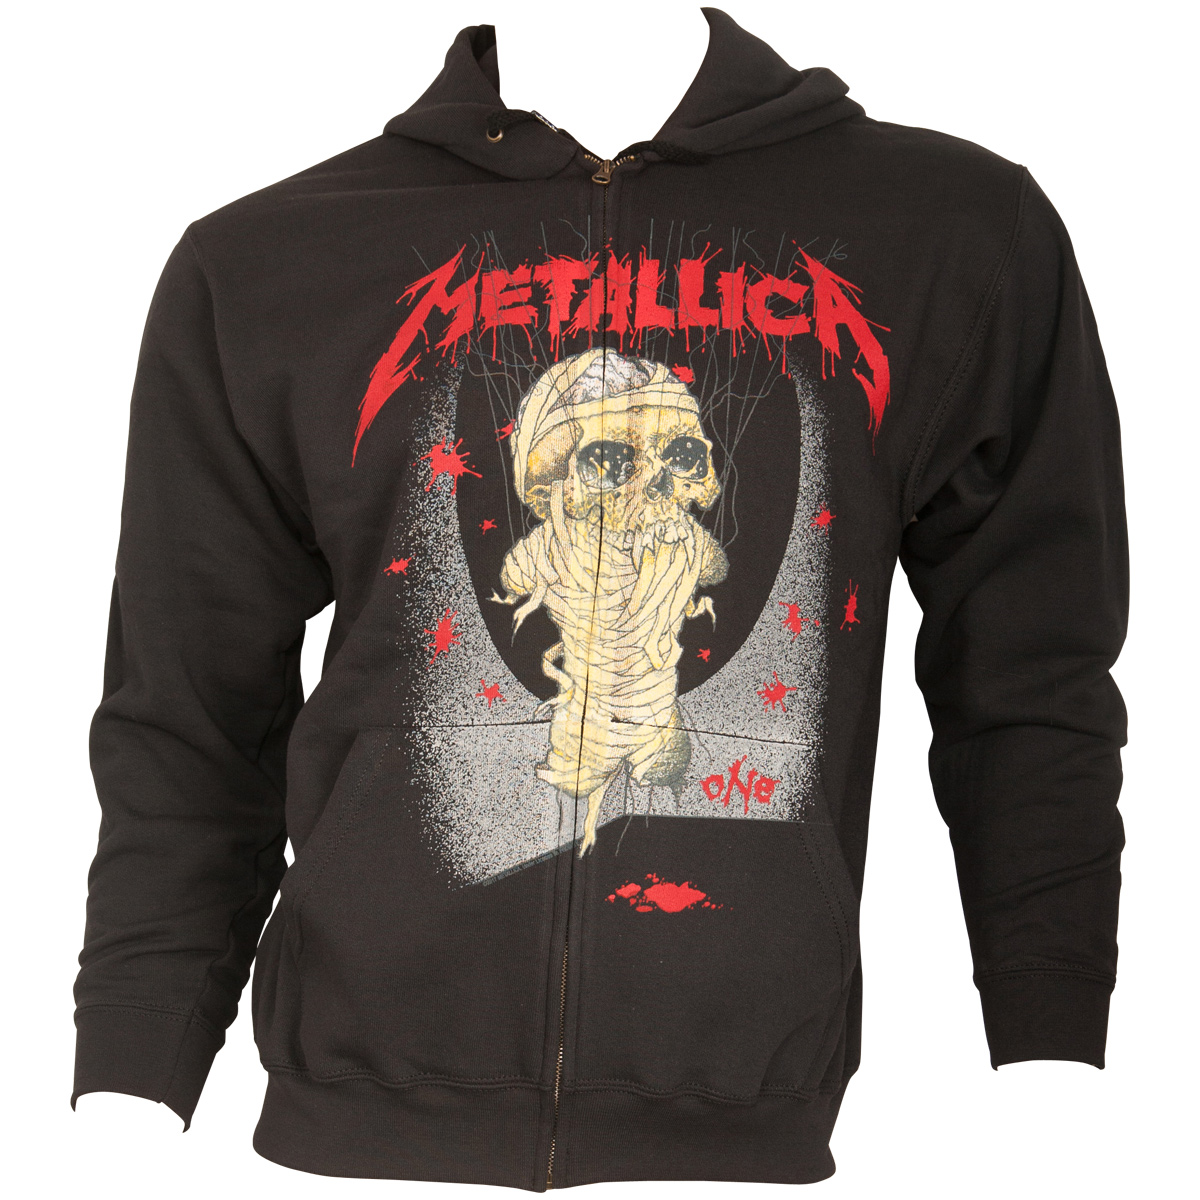 Metallica - Kapuzenjacke One Landmine - schwarz